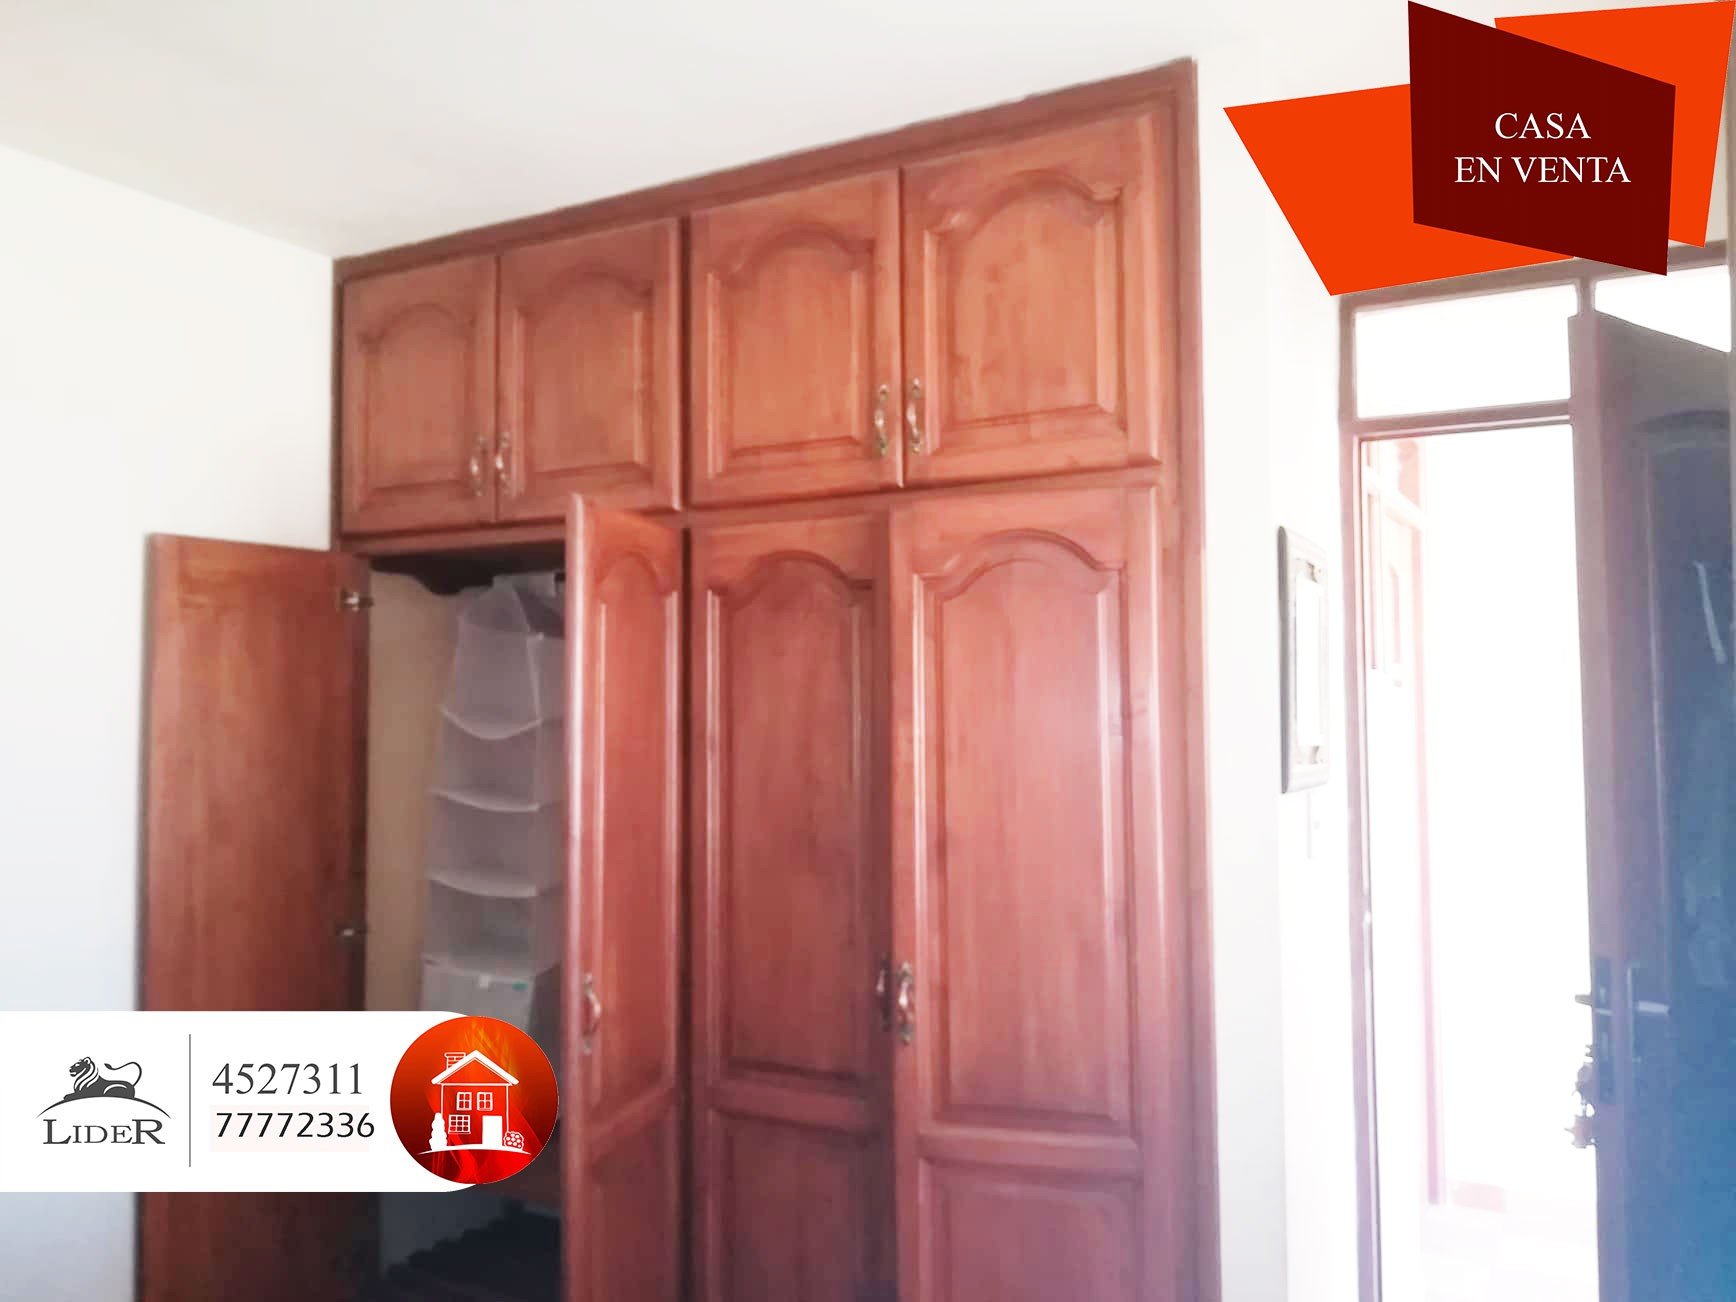 Casa en Venta PRÓXIMO AV. ROBLES Foto 5